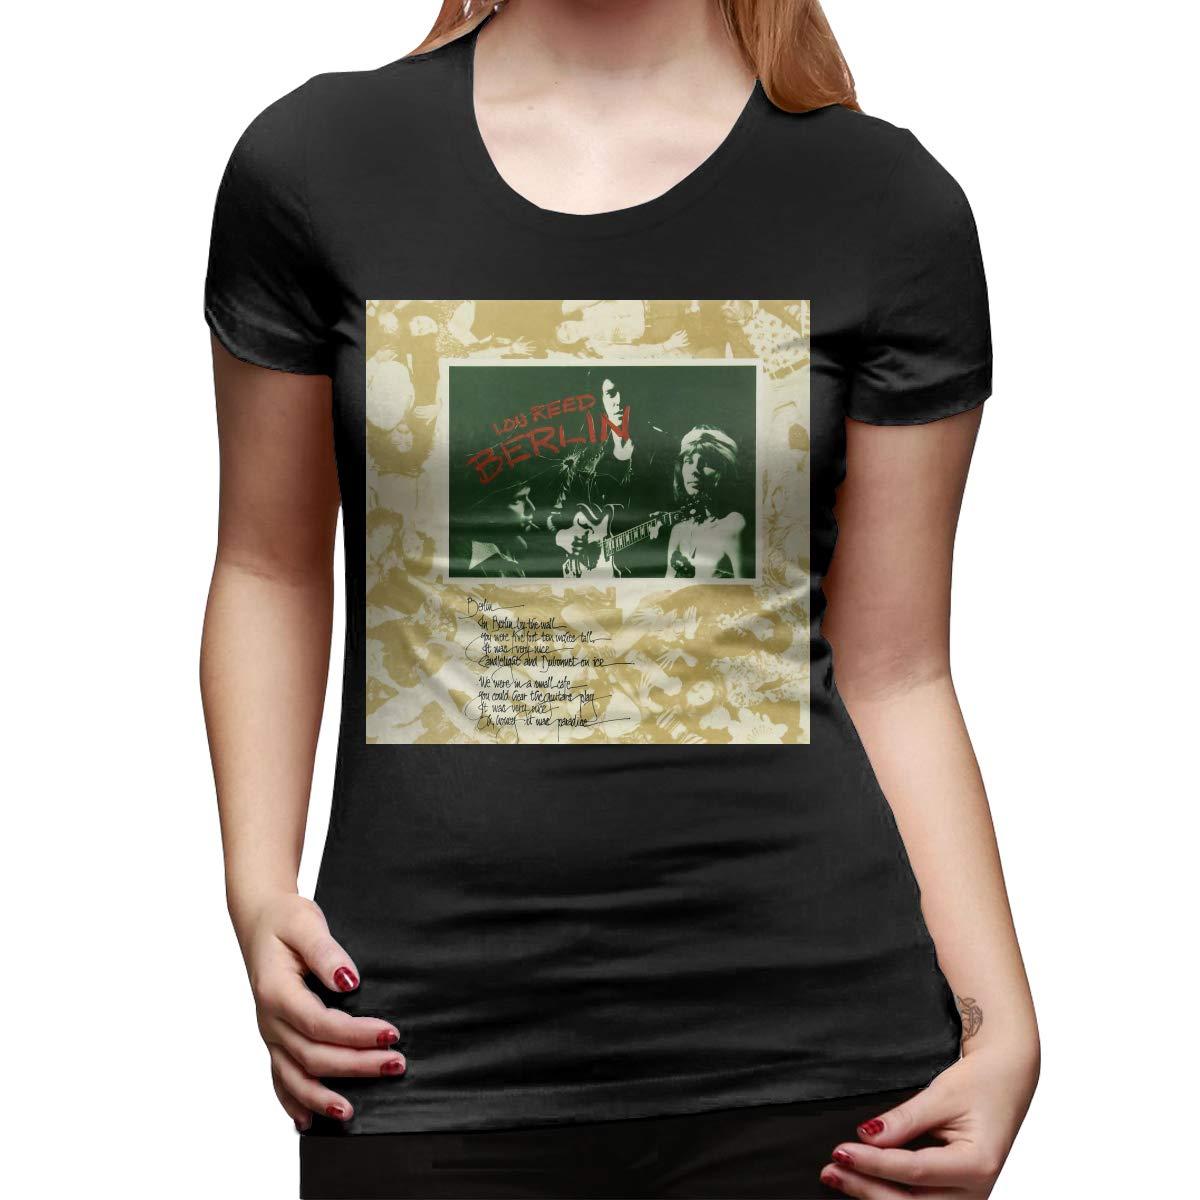 Lou Reed Berlin Womans Sports Music Theme Short Sleeve Shirts